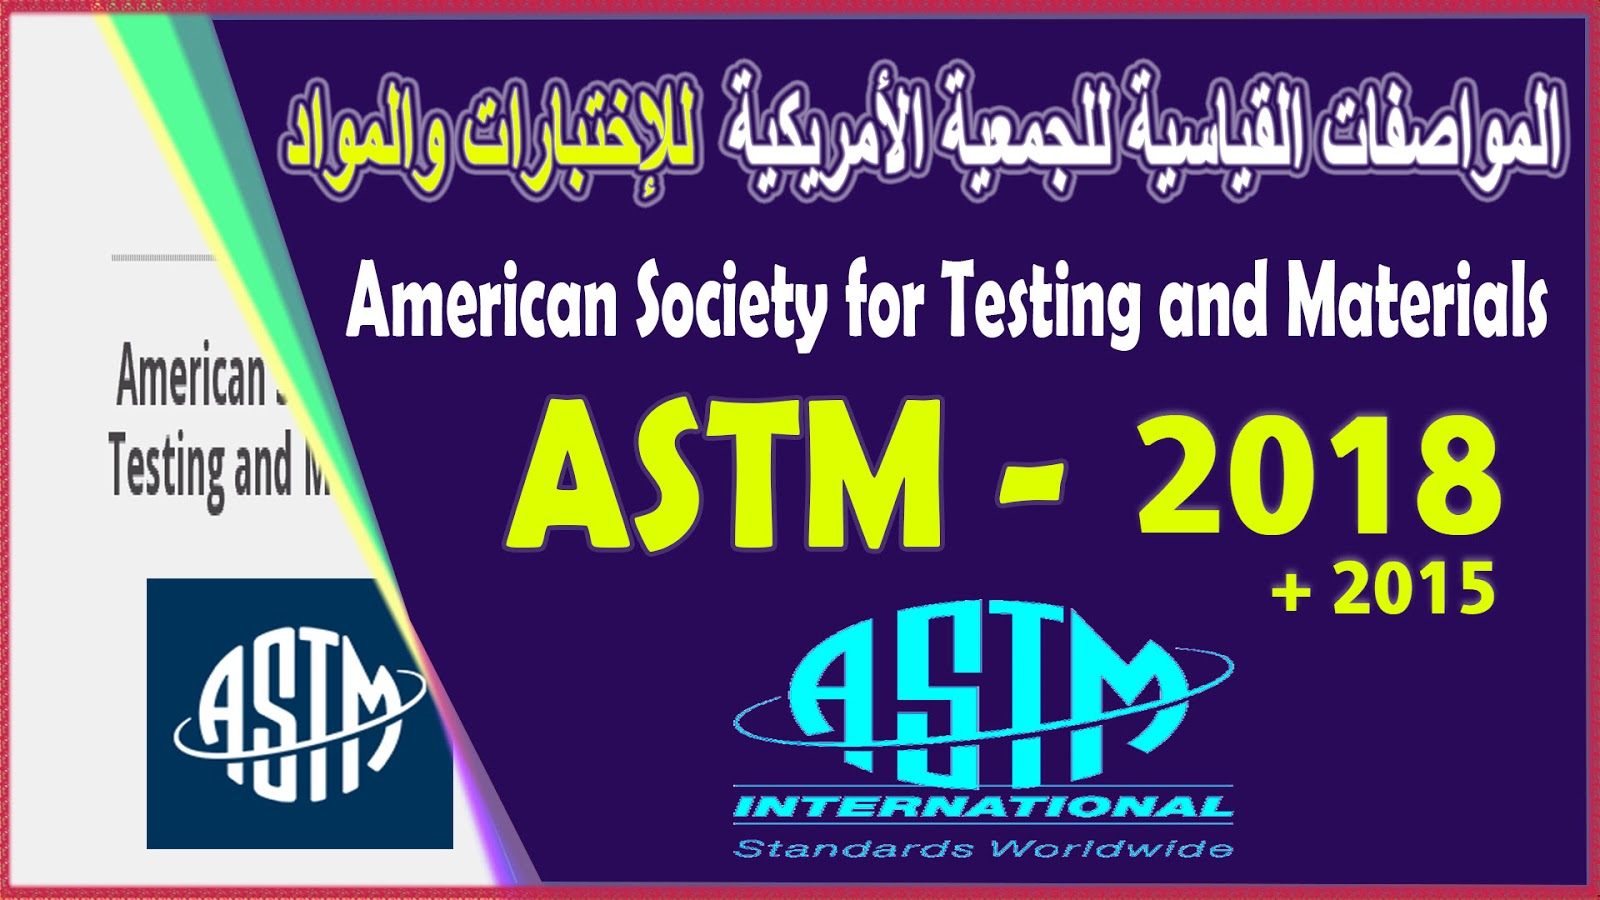 ASTM   المواصفات القياسية للجمعية الأمريكية للإختبار والمواد كاملة